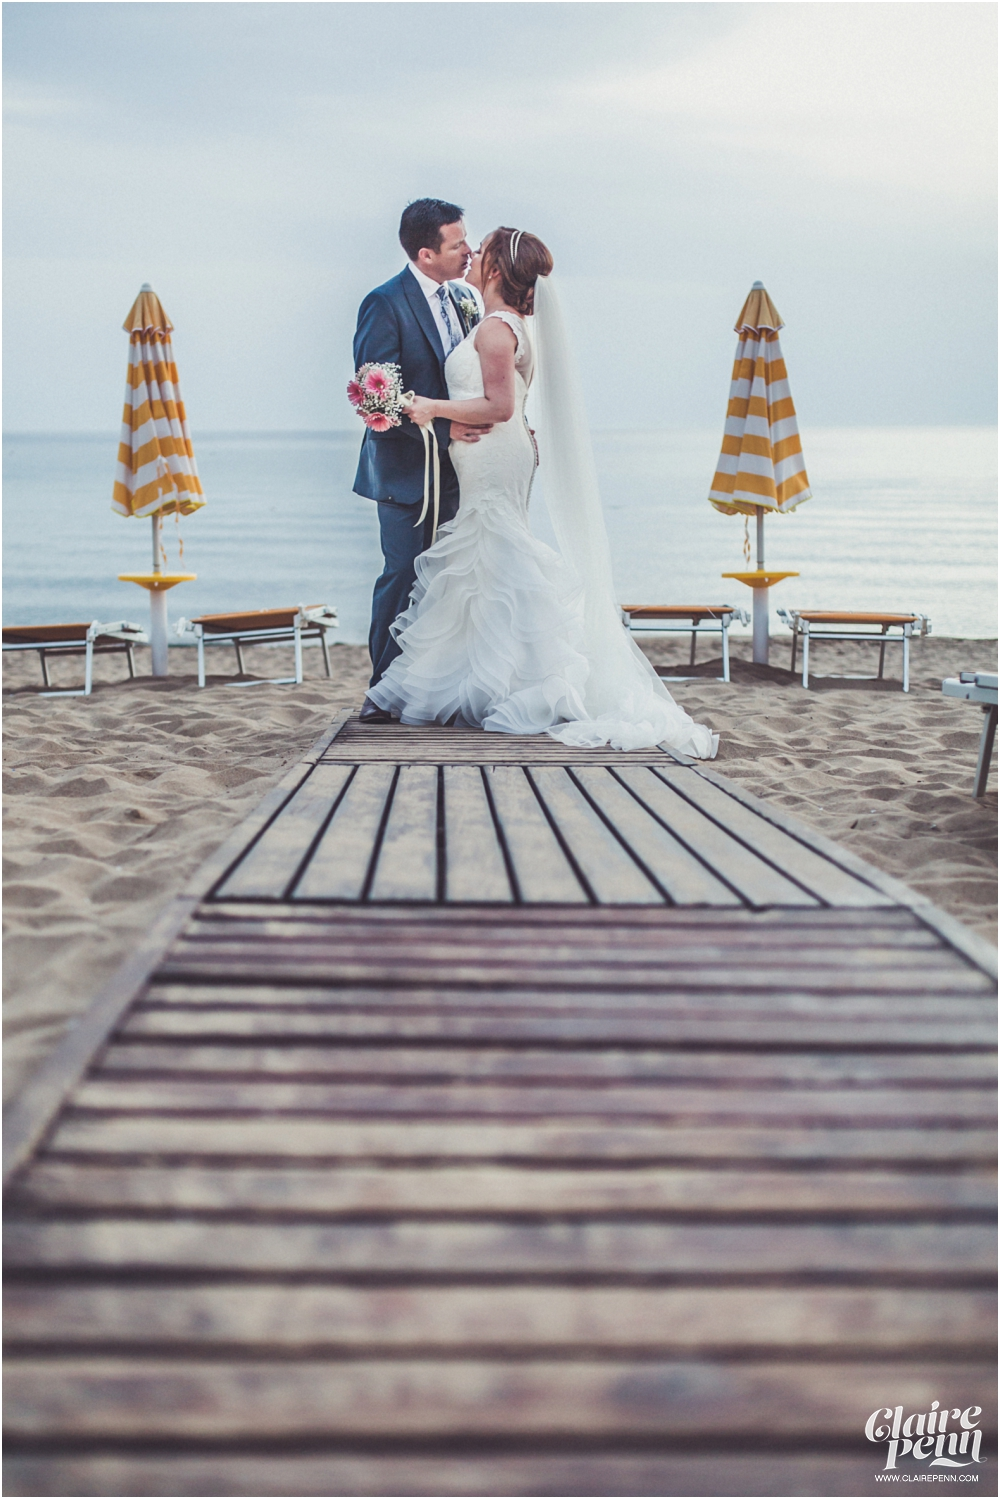 Italy Santa Maria Cilento coast Amalfi destination wedding photographer_0064.jpg